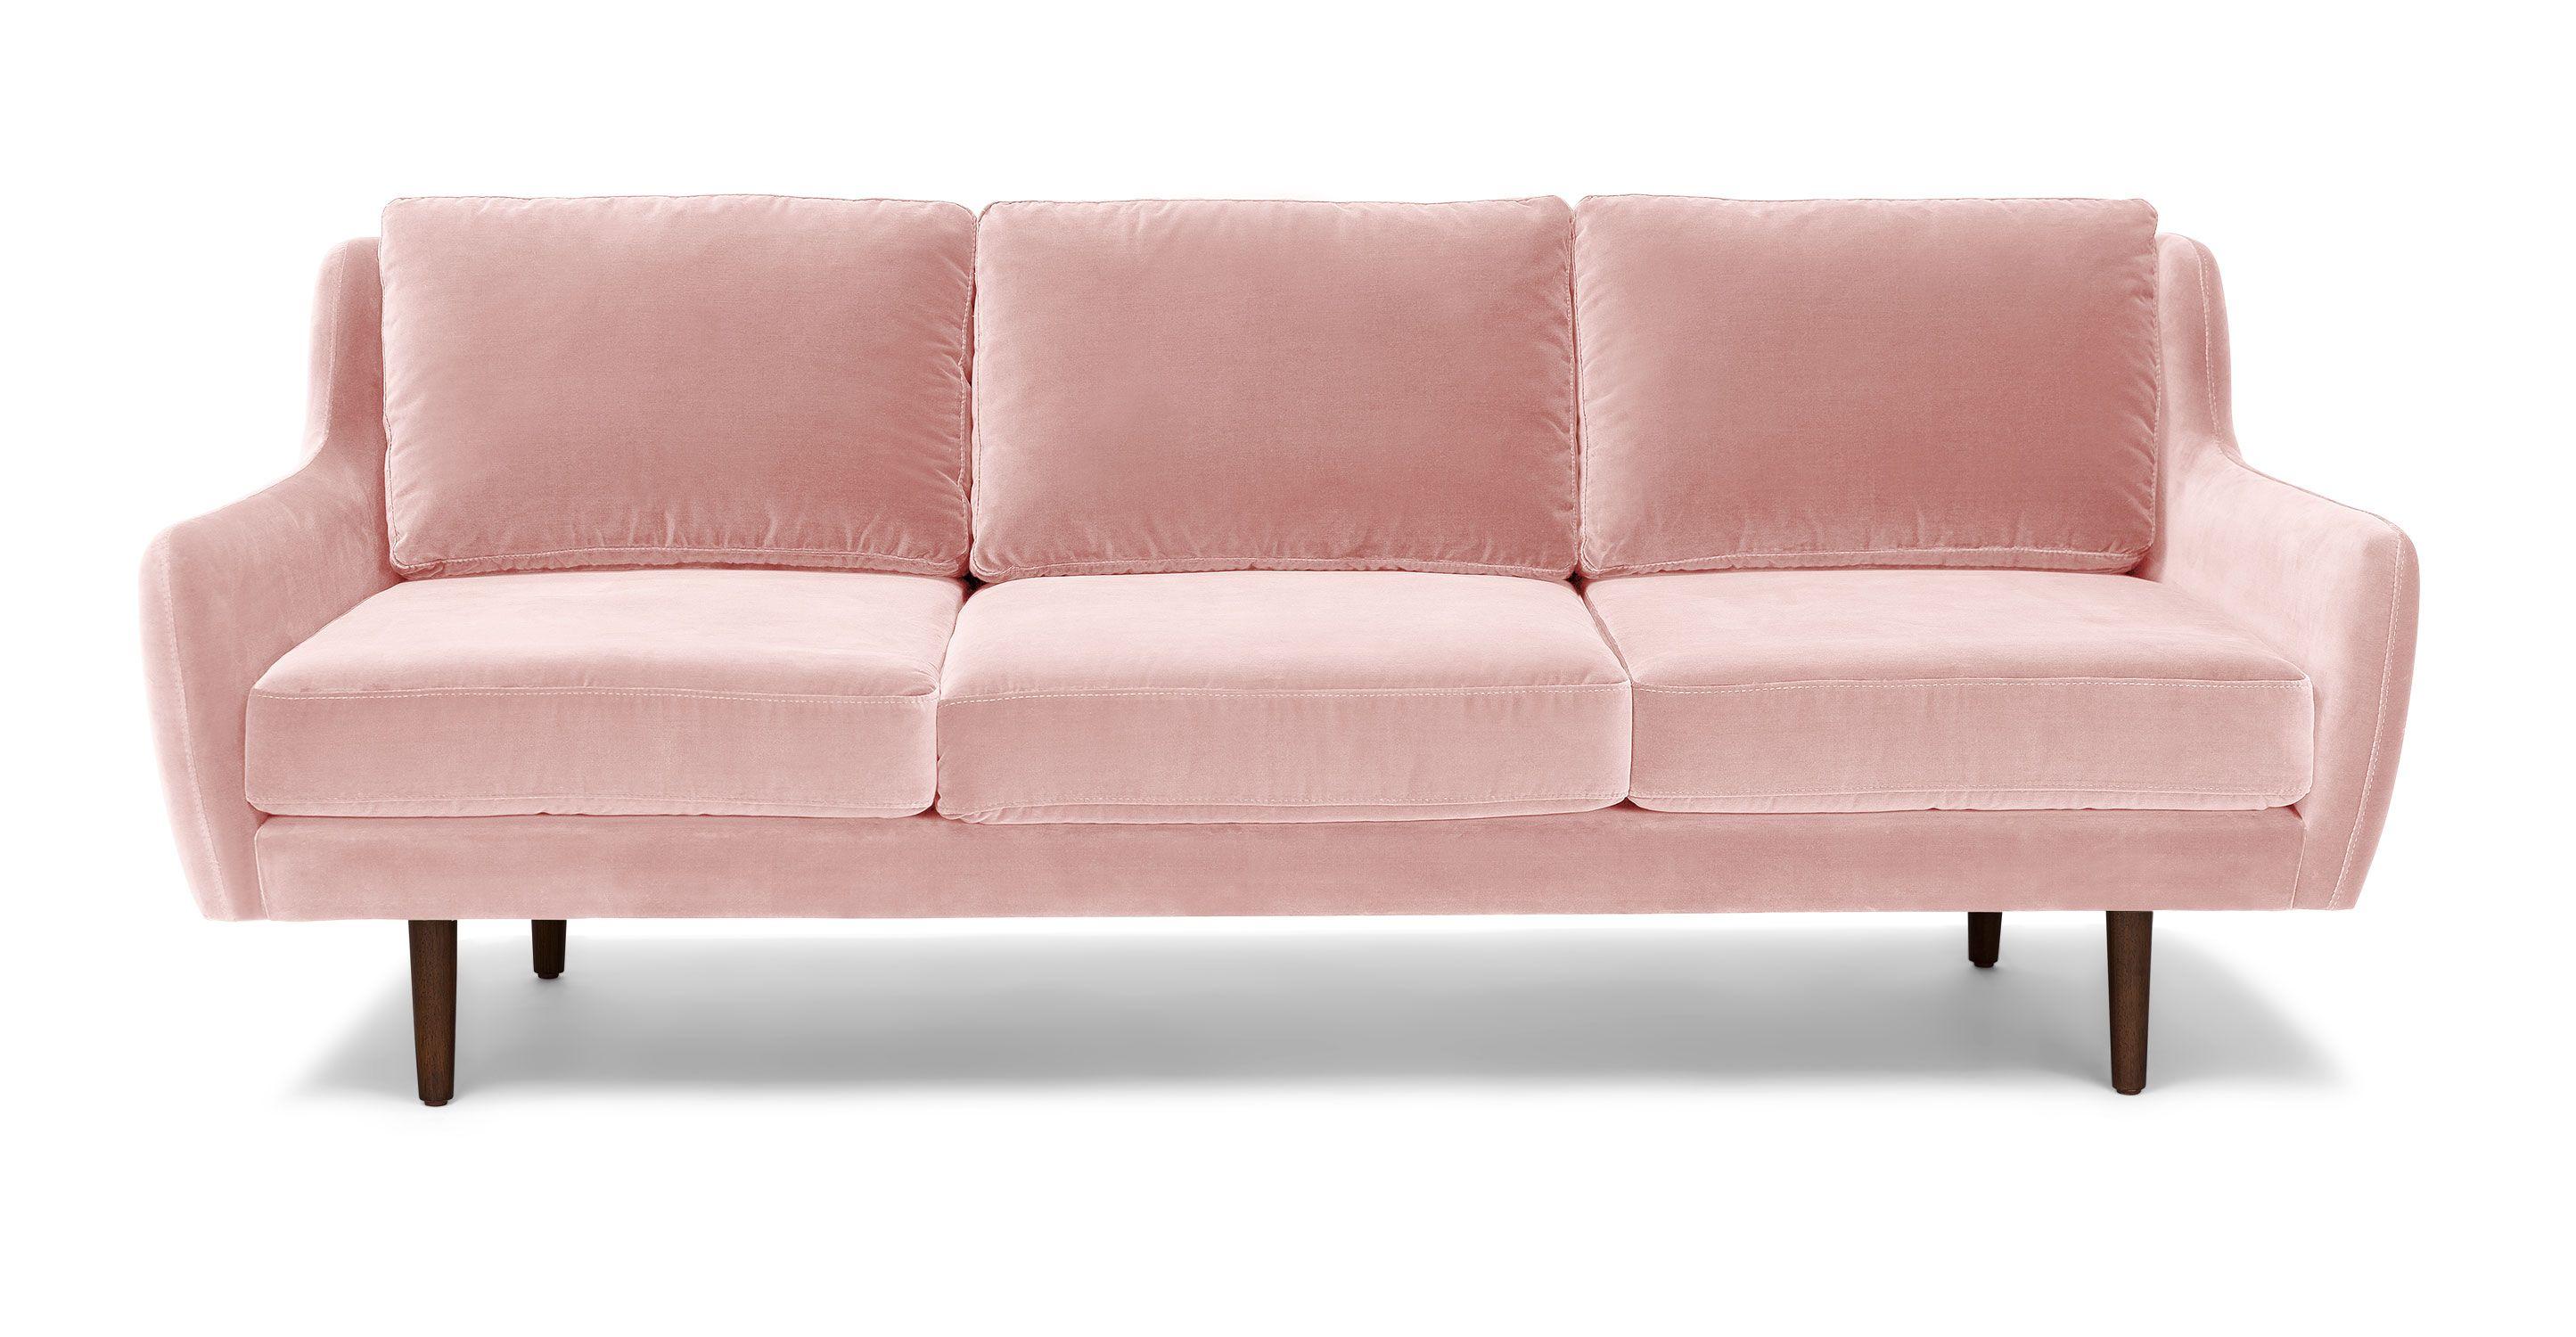 Matrix Blush Pink Sofa Sofas Article Modern Mid Century And